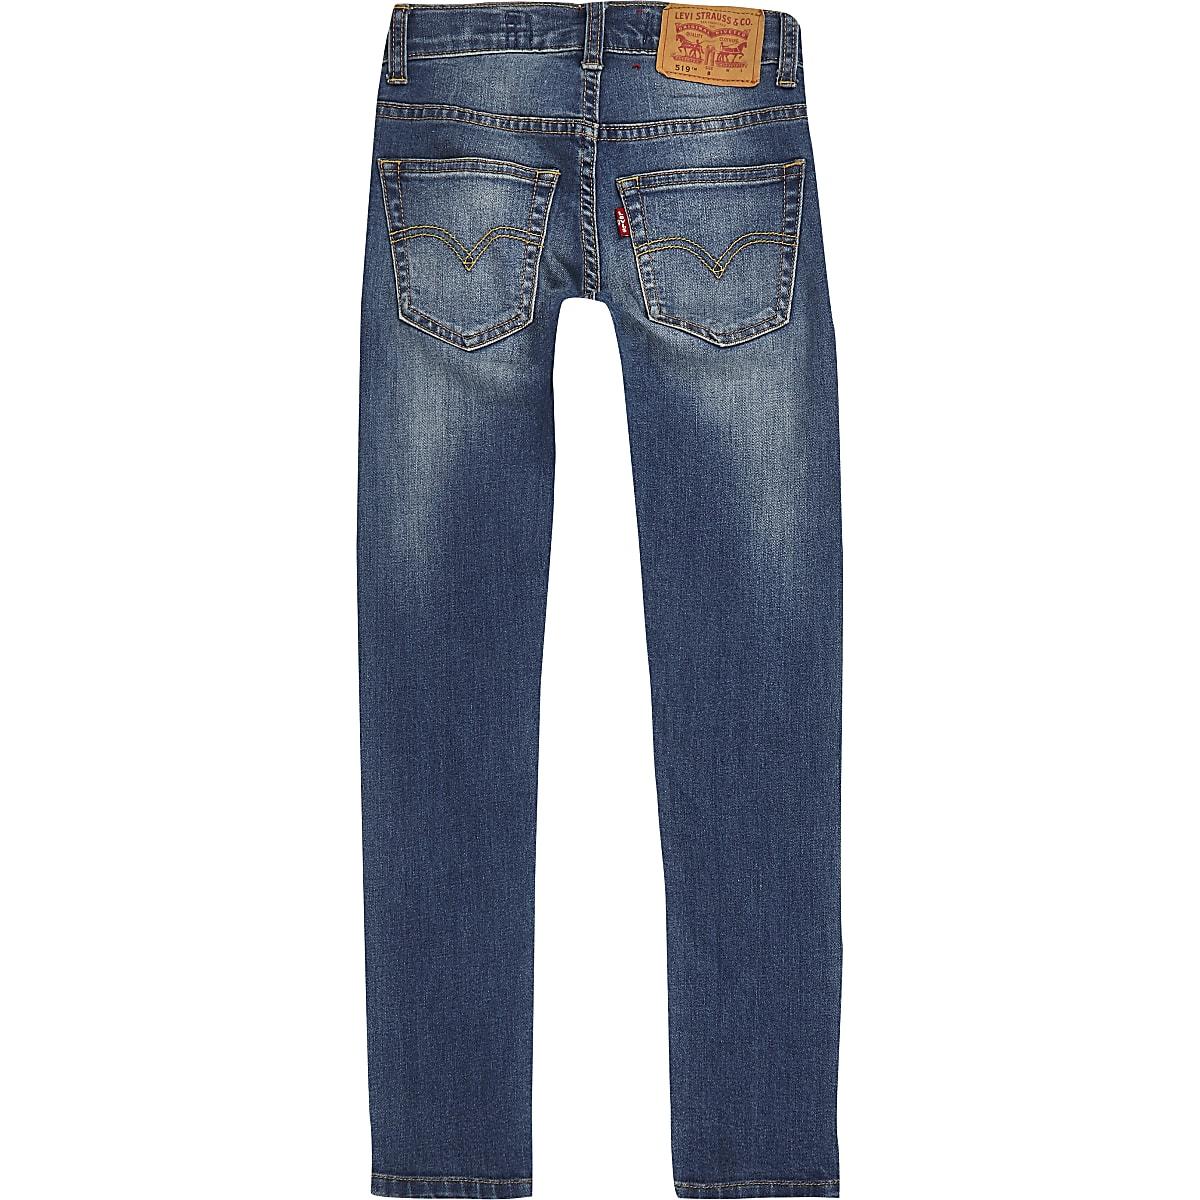 90f3346b6 Boys Levi's blue skinny fit jeans - Skinny Jeans - Jeans - boys